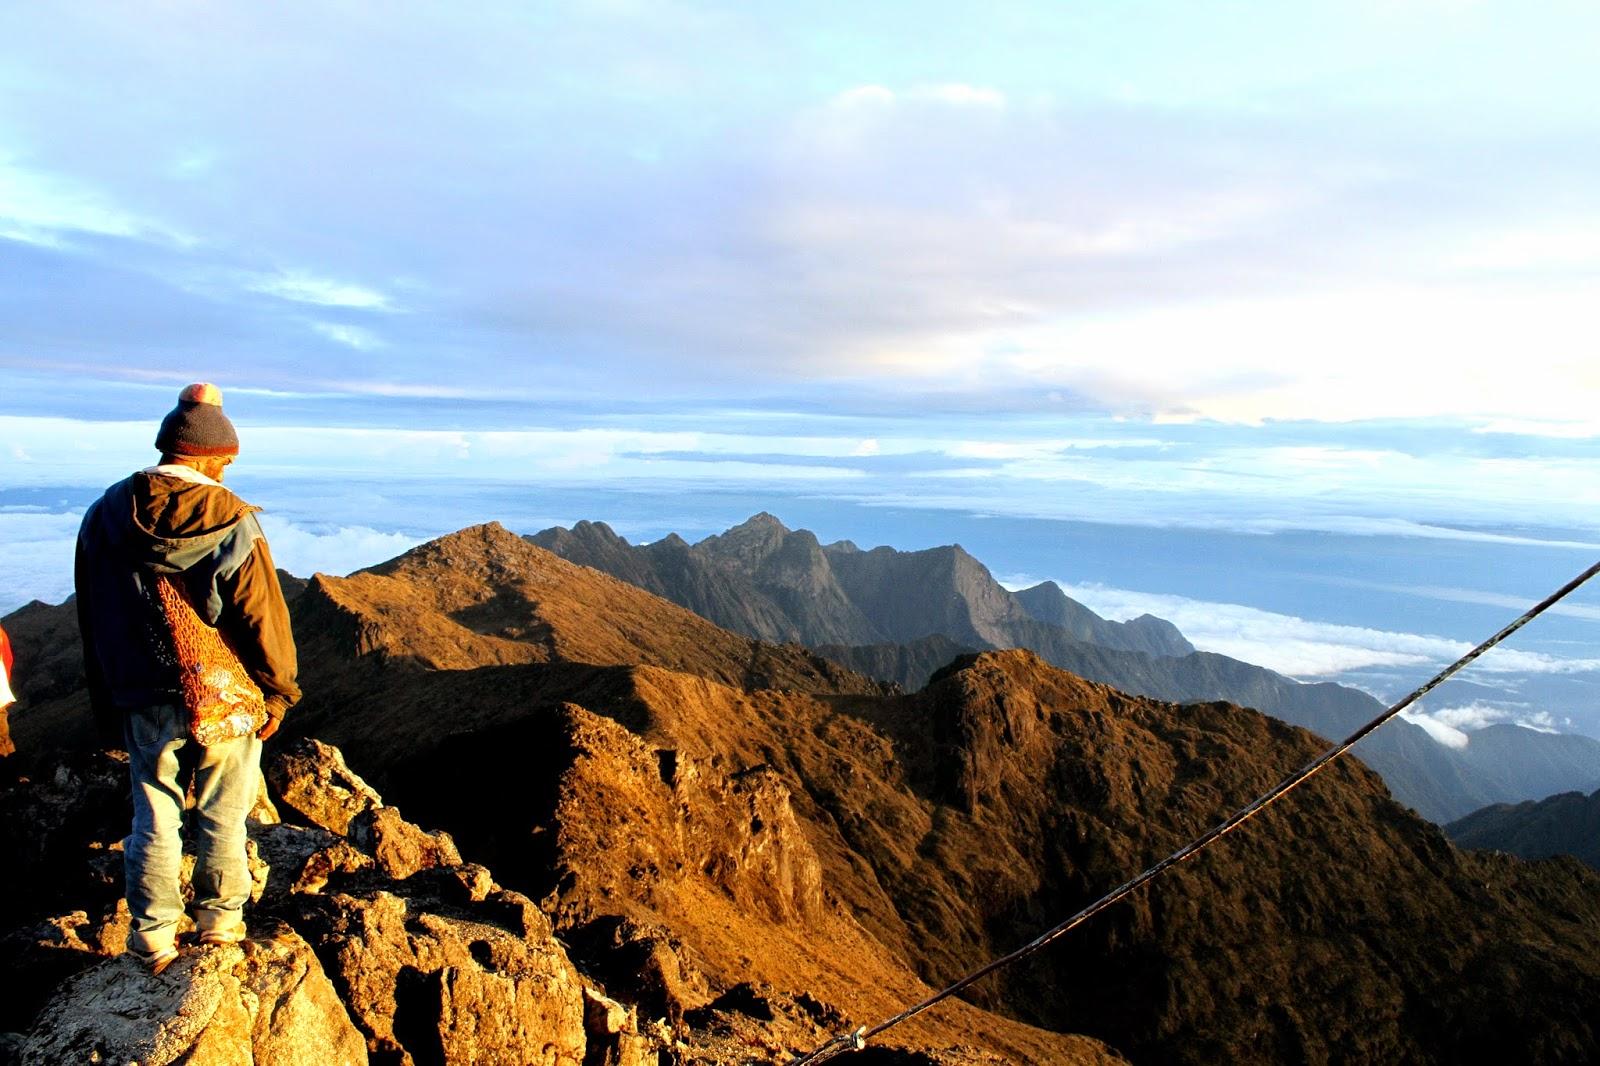 The summit of Mount Wilhelm.